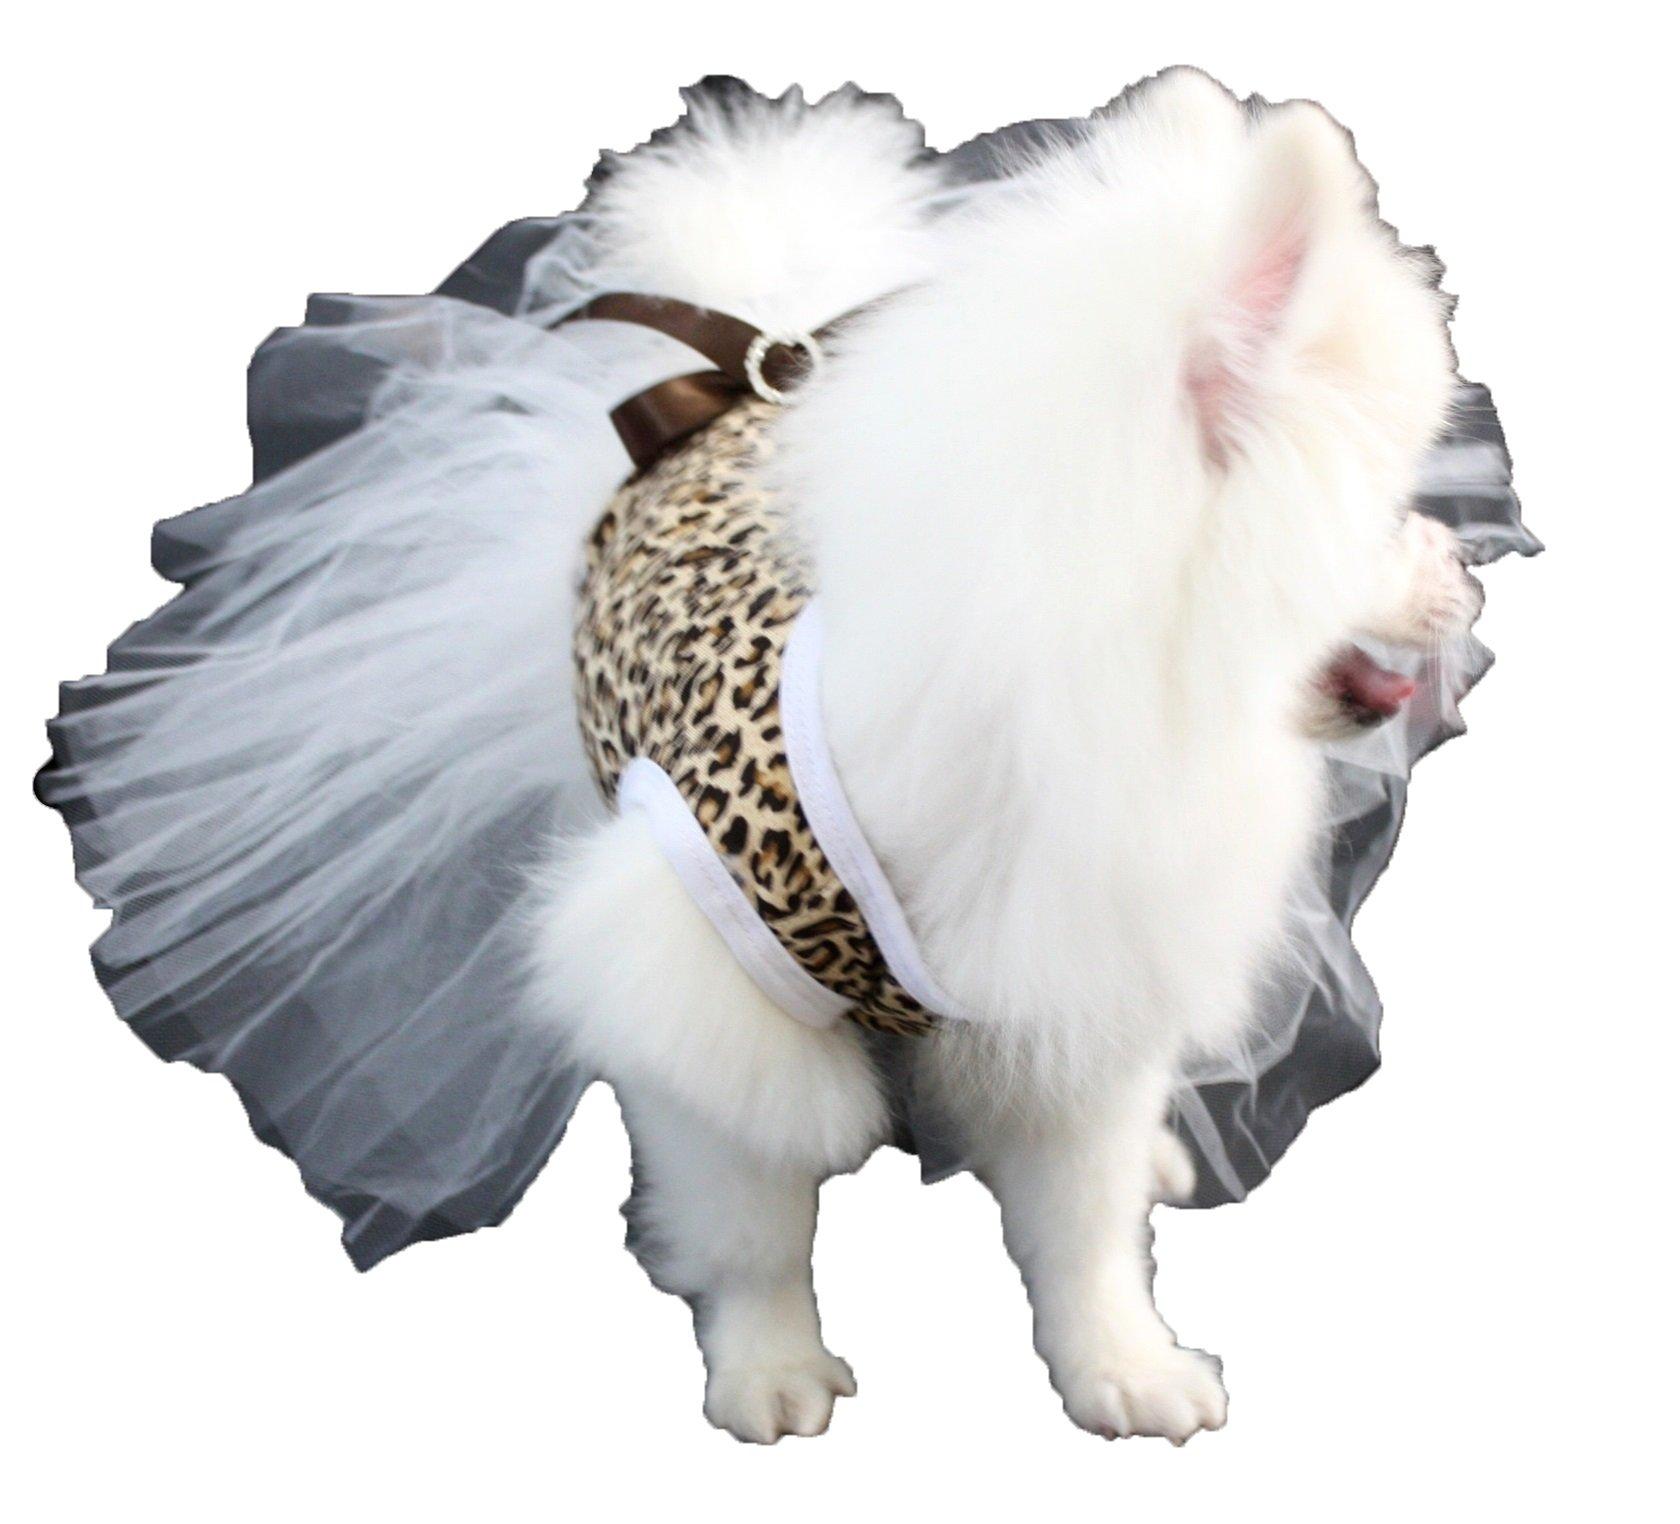 Puppy Clothes Dog Dress Leopard Cotton Top White Tutu Animal Wear (Medium)